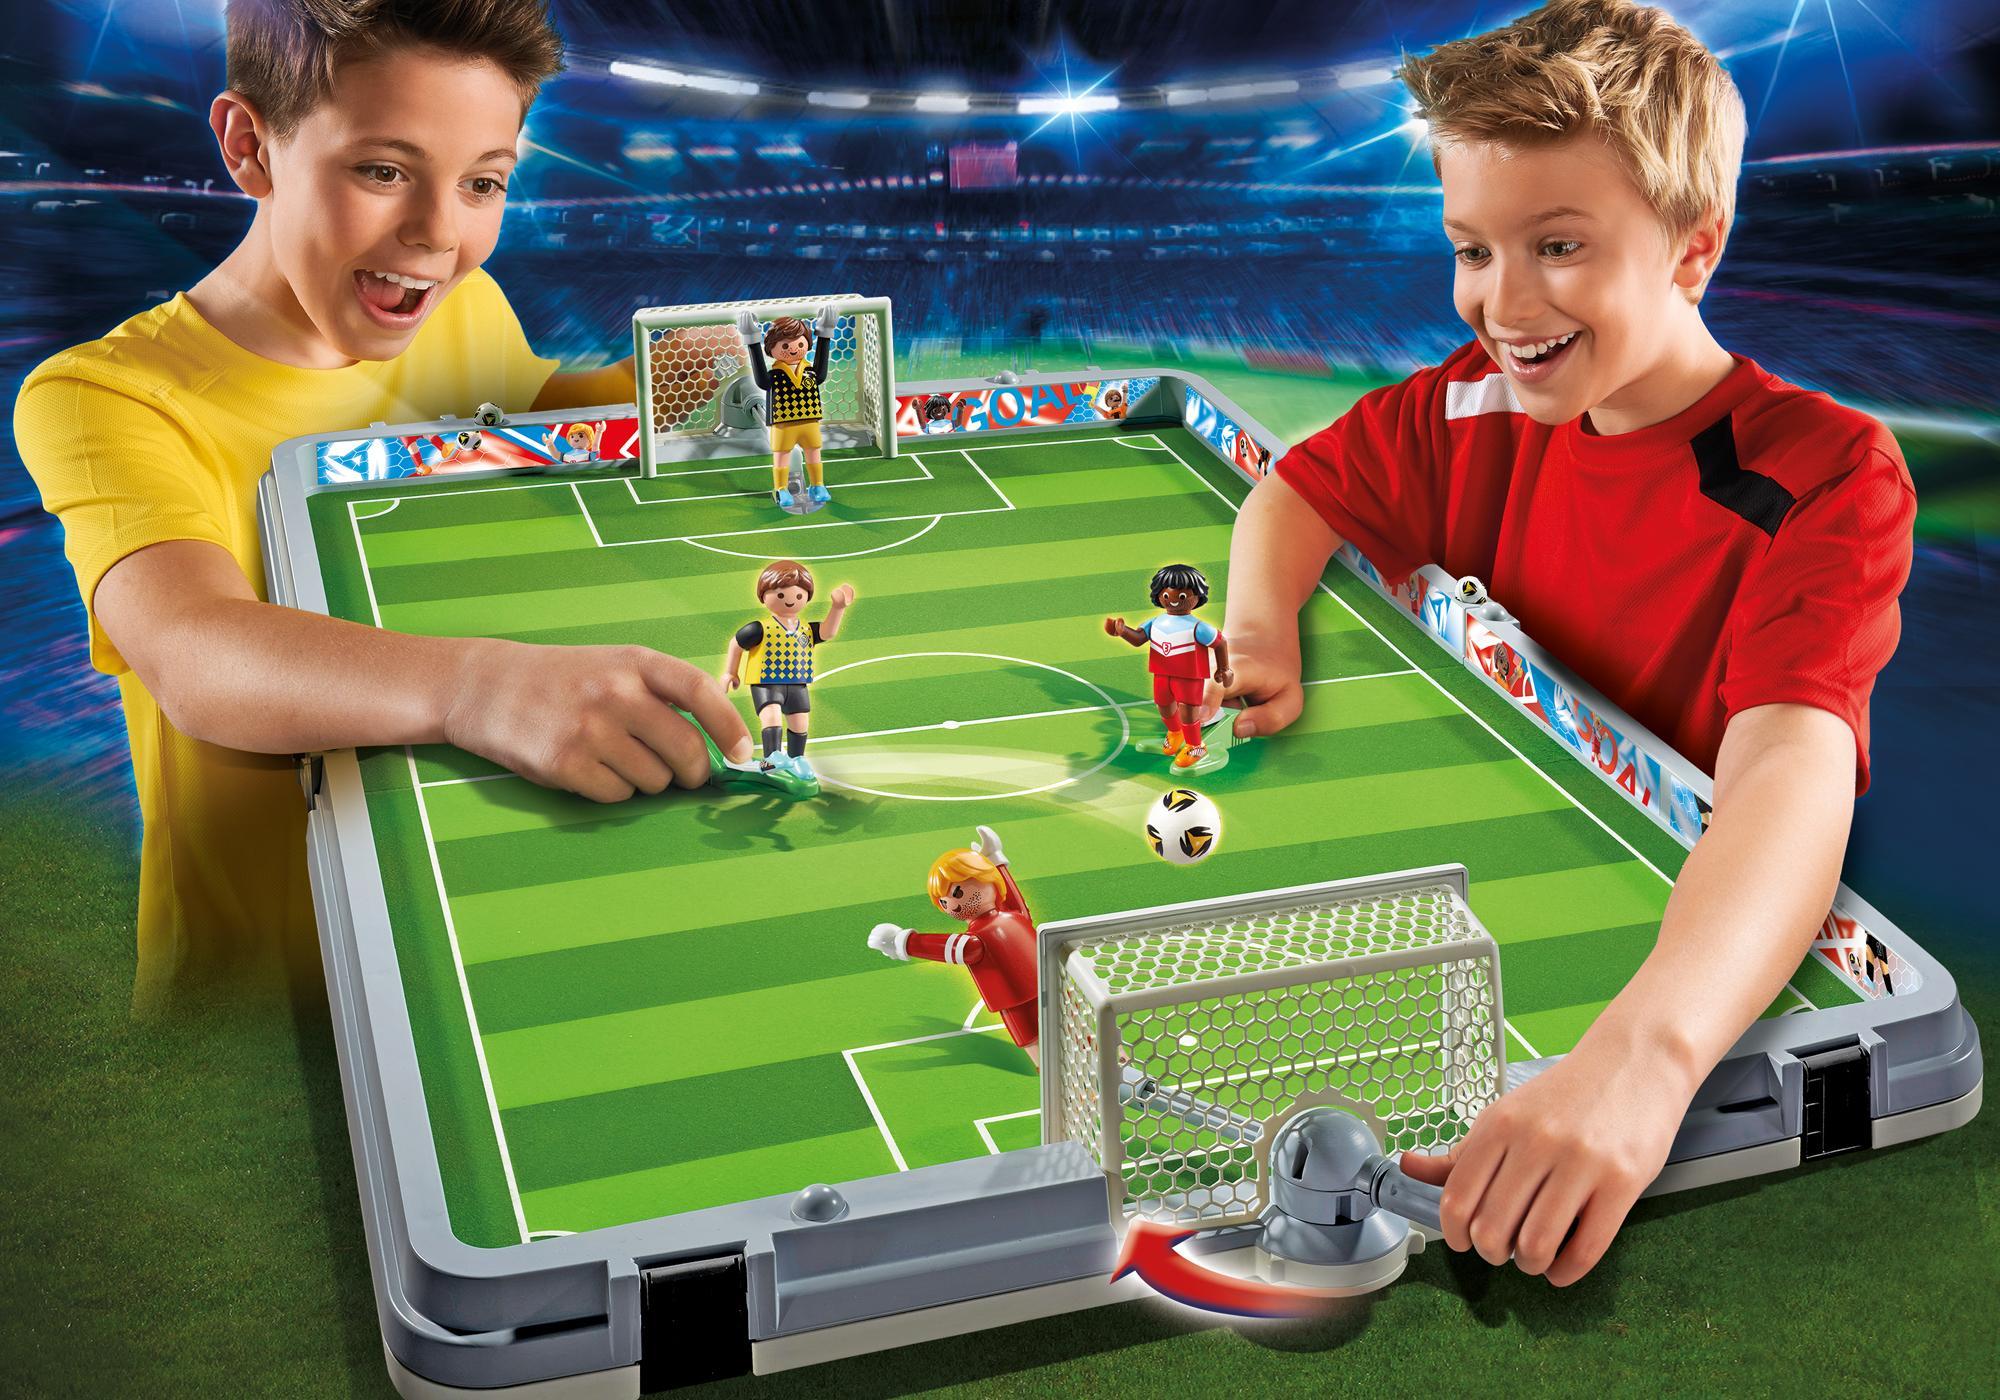 6857_product_detail/Set de Fútbol Maletín